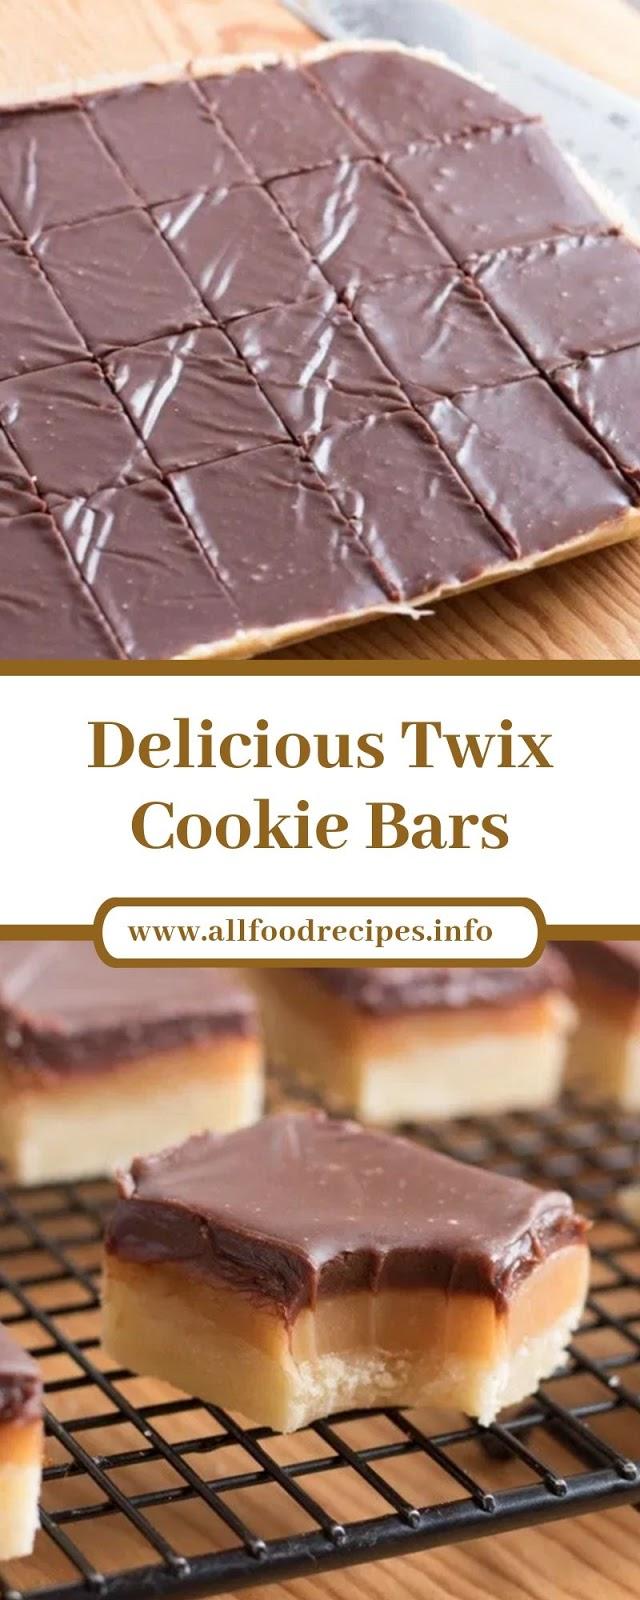 Delicious Twix Cookie Bars